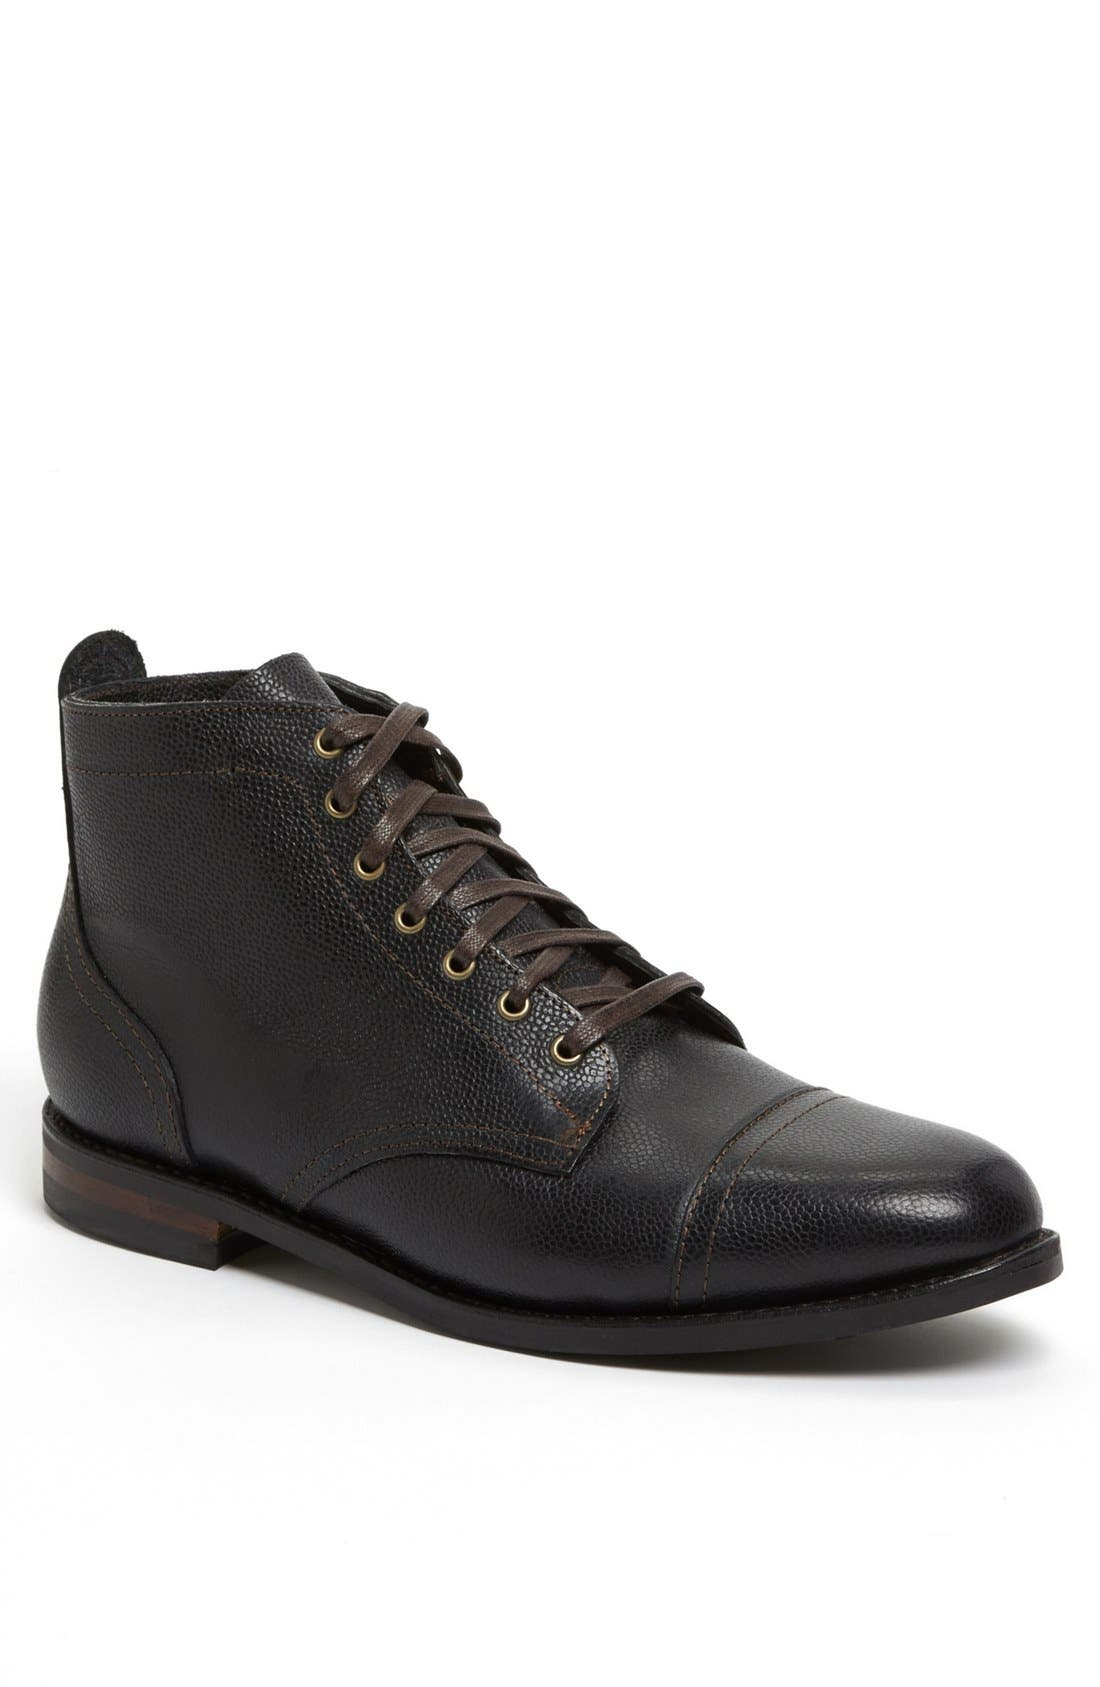 Alternate Image 1 Selected - Allen Edmonds 'Promontory Point' Cap Toe Boot (Men)